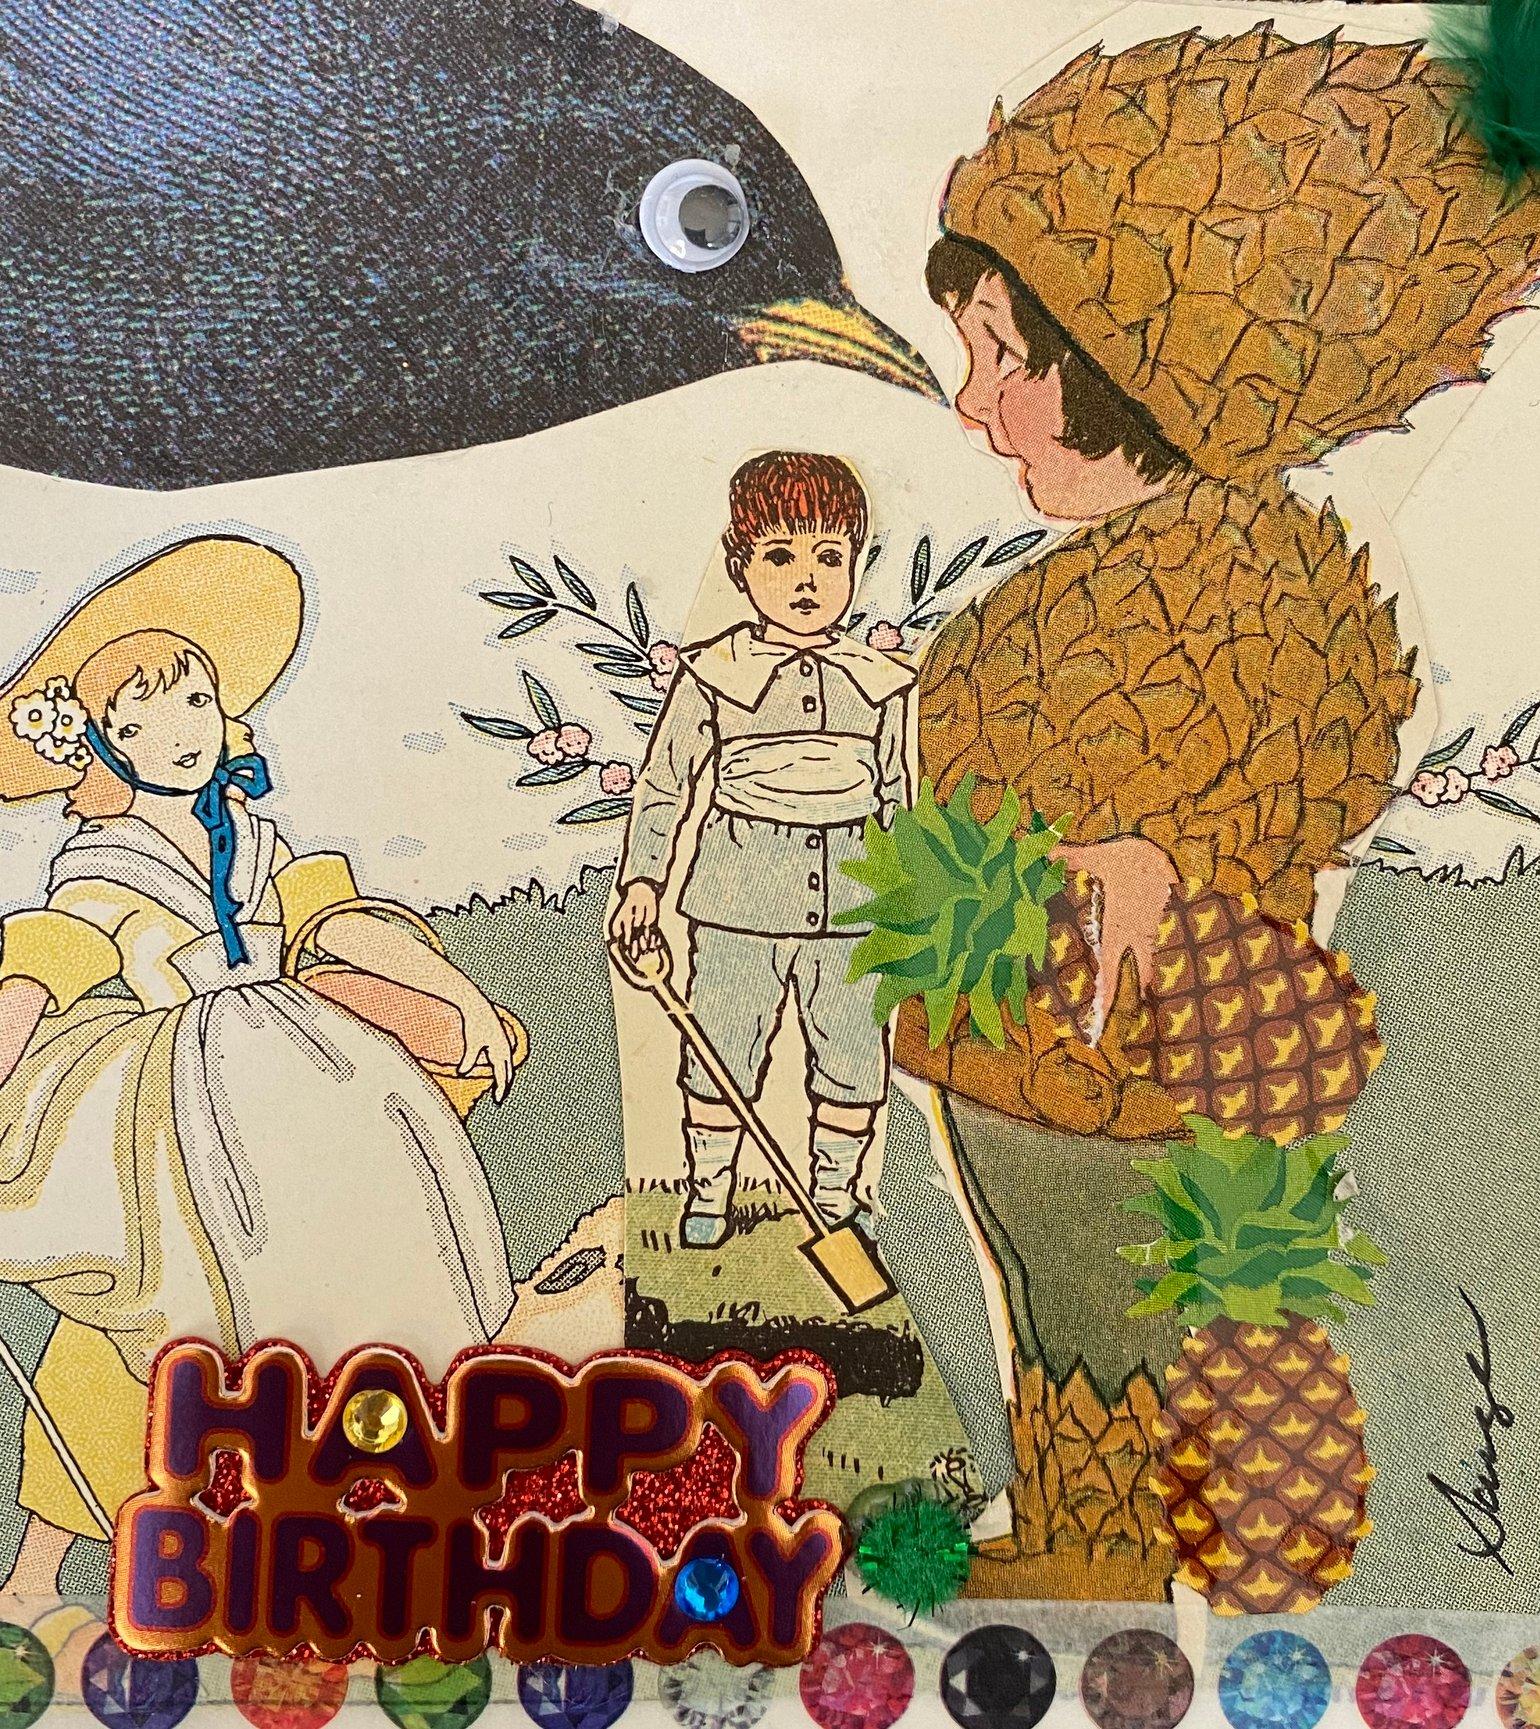 Image of Pineapple birthday